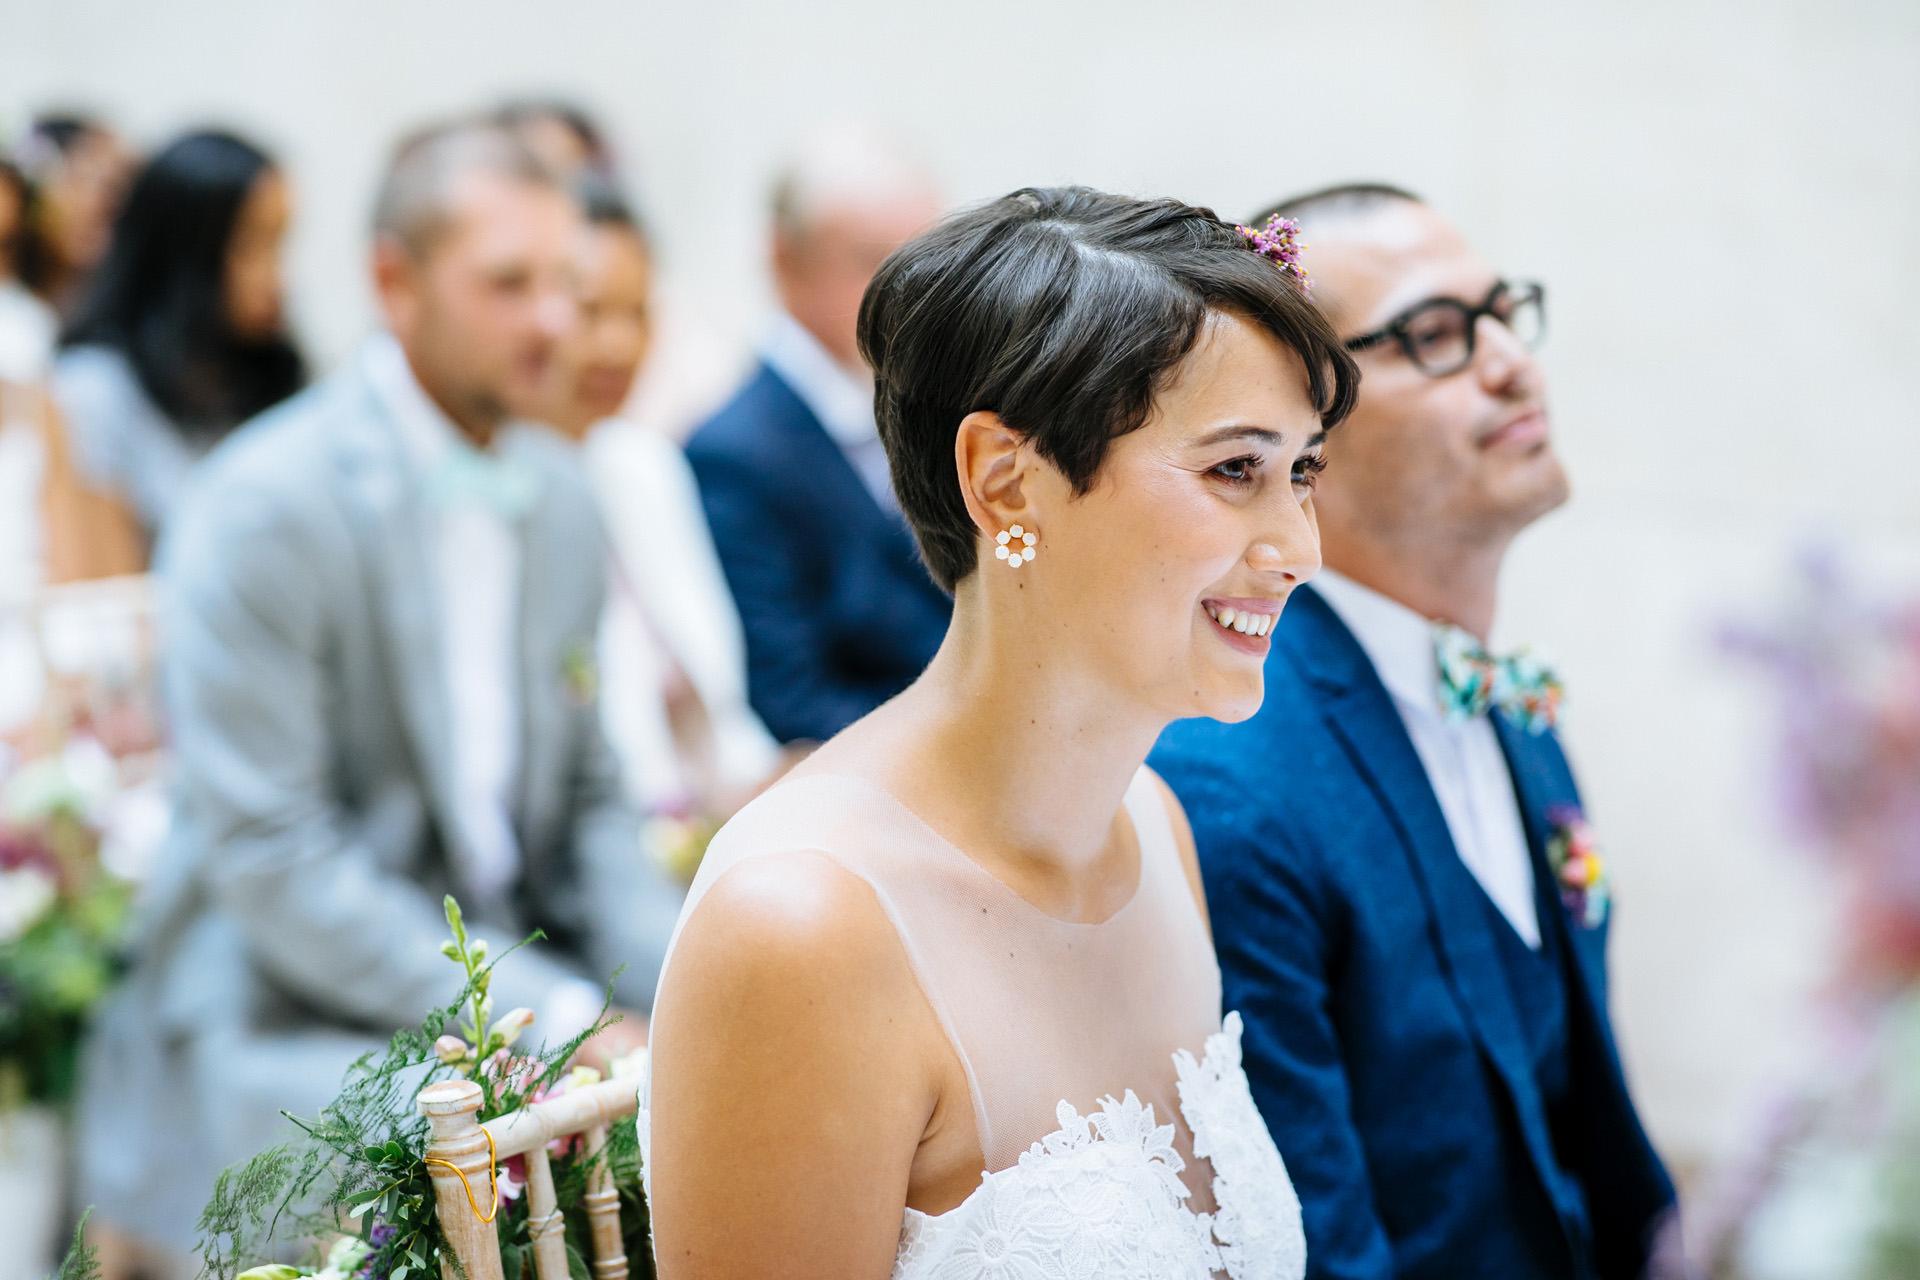 Hammersmith town hall wedding bride smiling